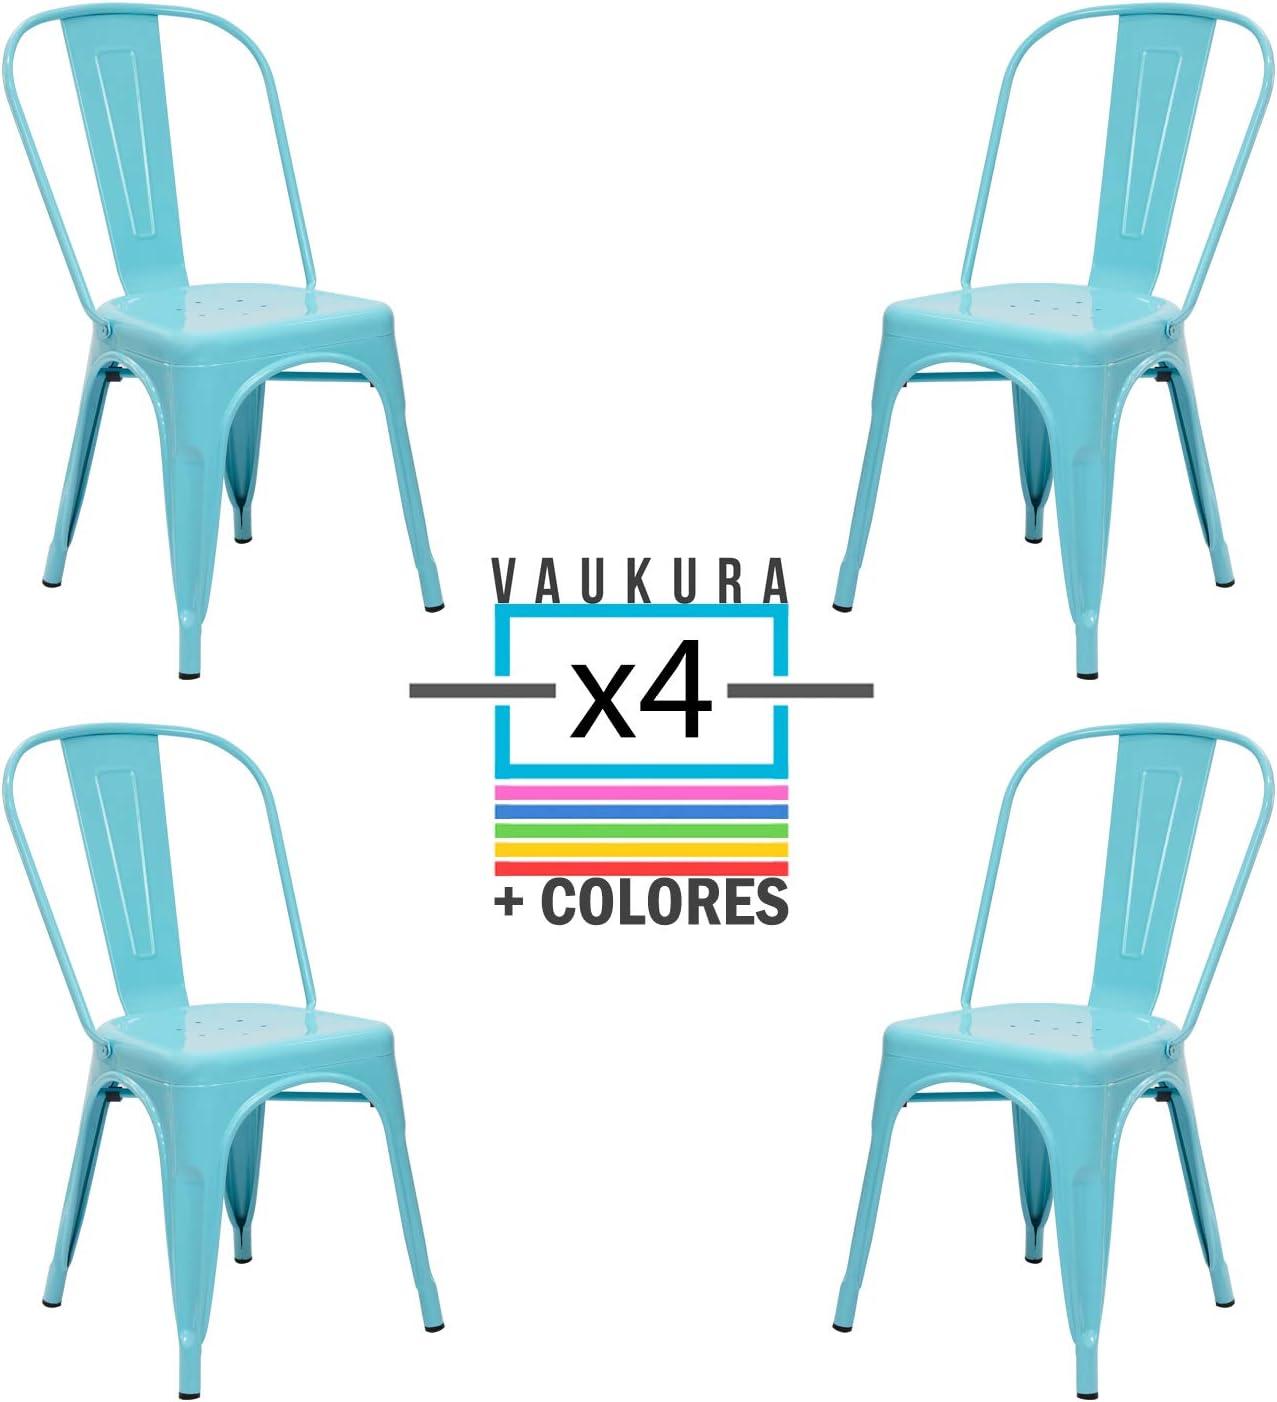 Vaukura Silla Tolix(Pack 4) - Silla Industrial Metálica Brillo (Azul Cielo)